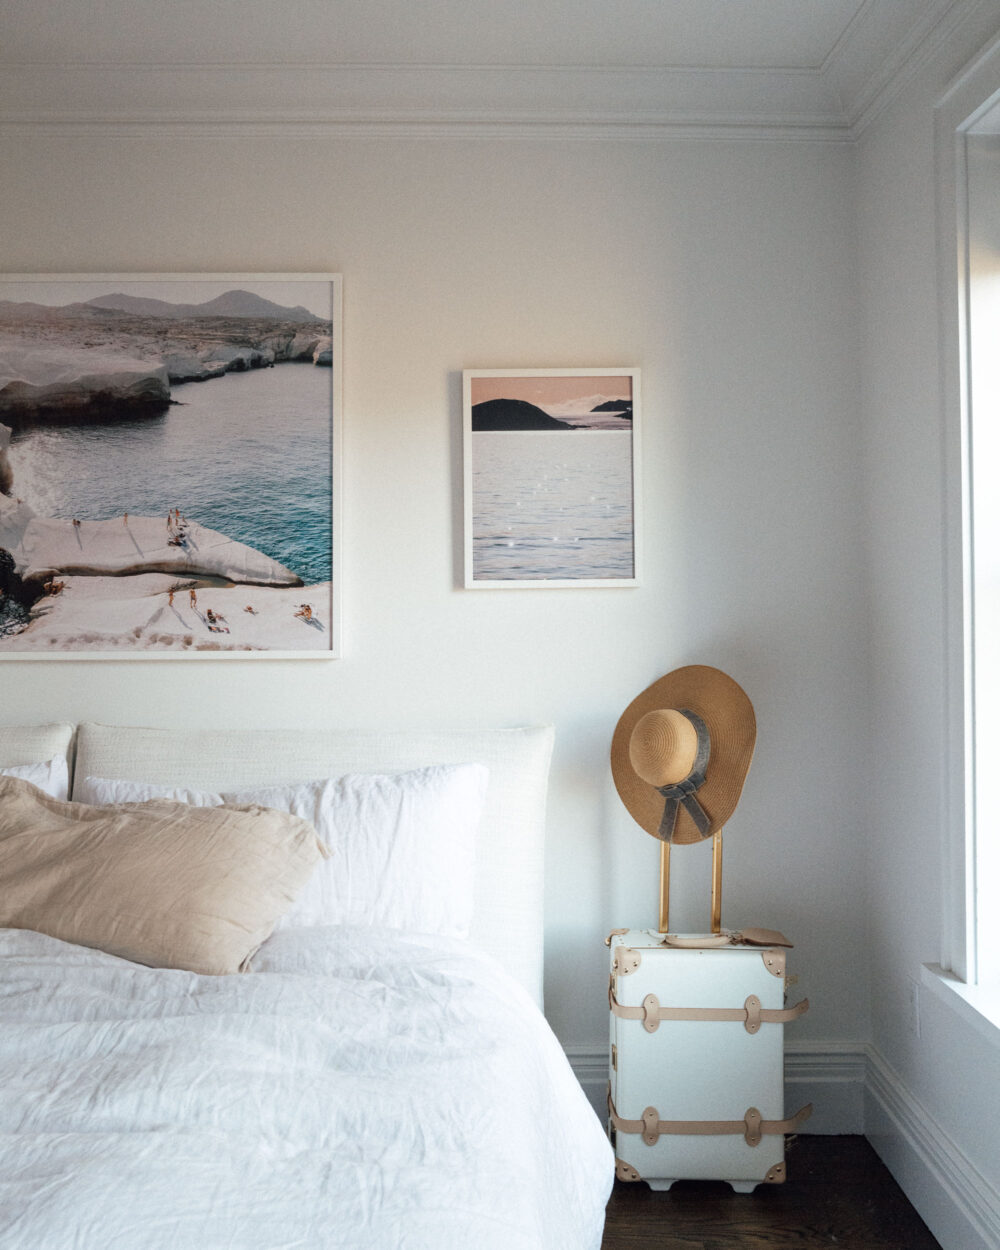 Sunset Print Norway in Bedroom Find Us Lost Prints